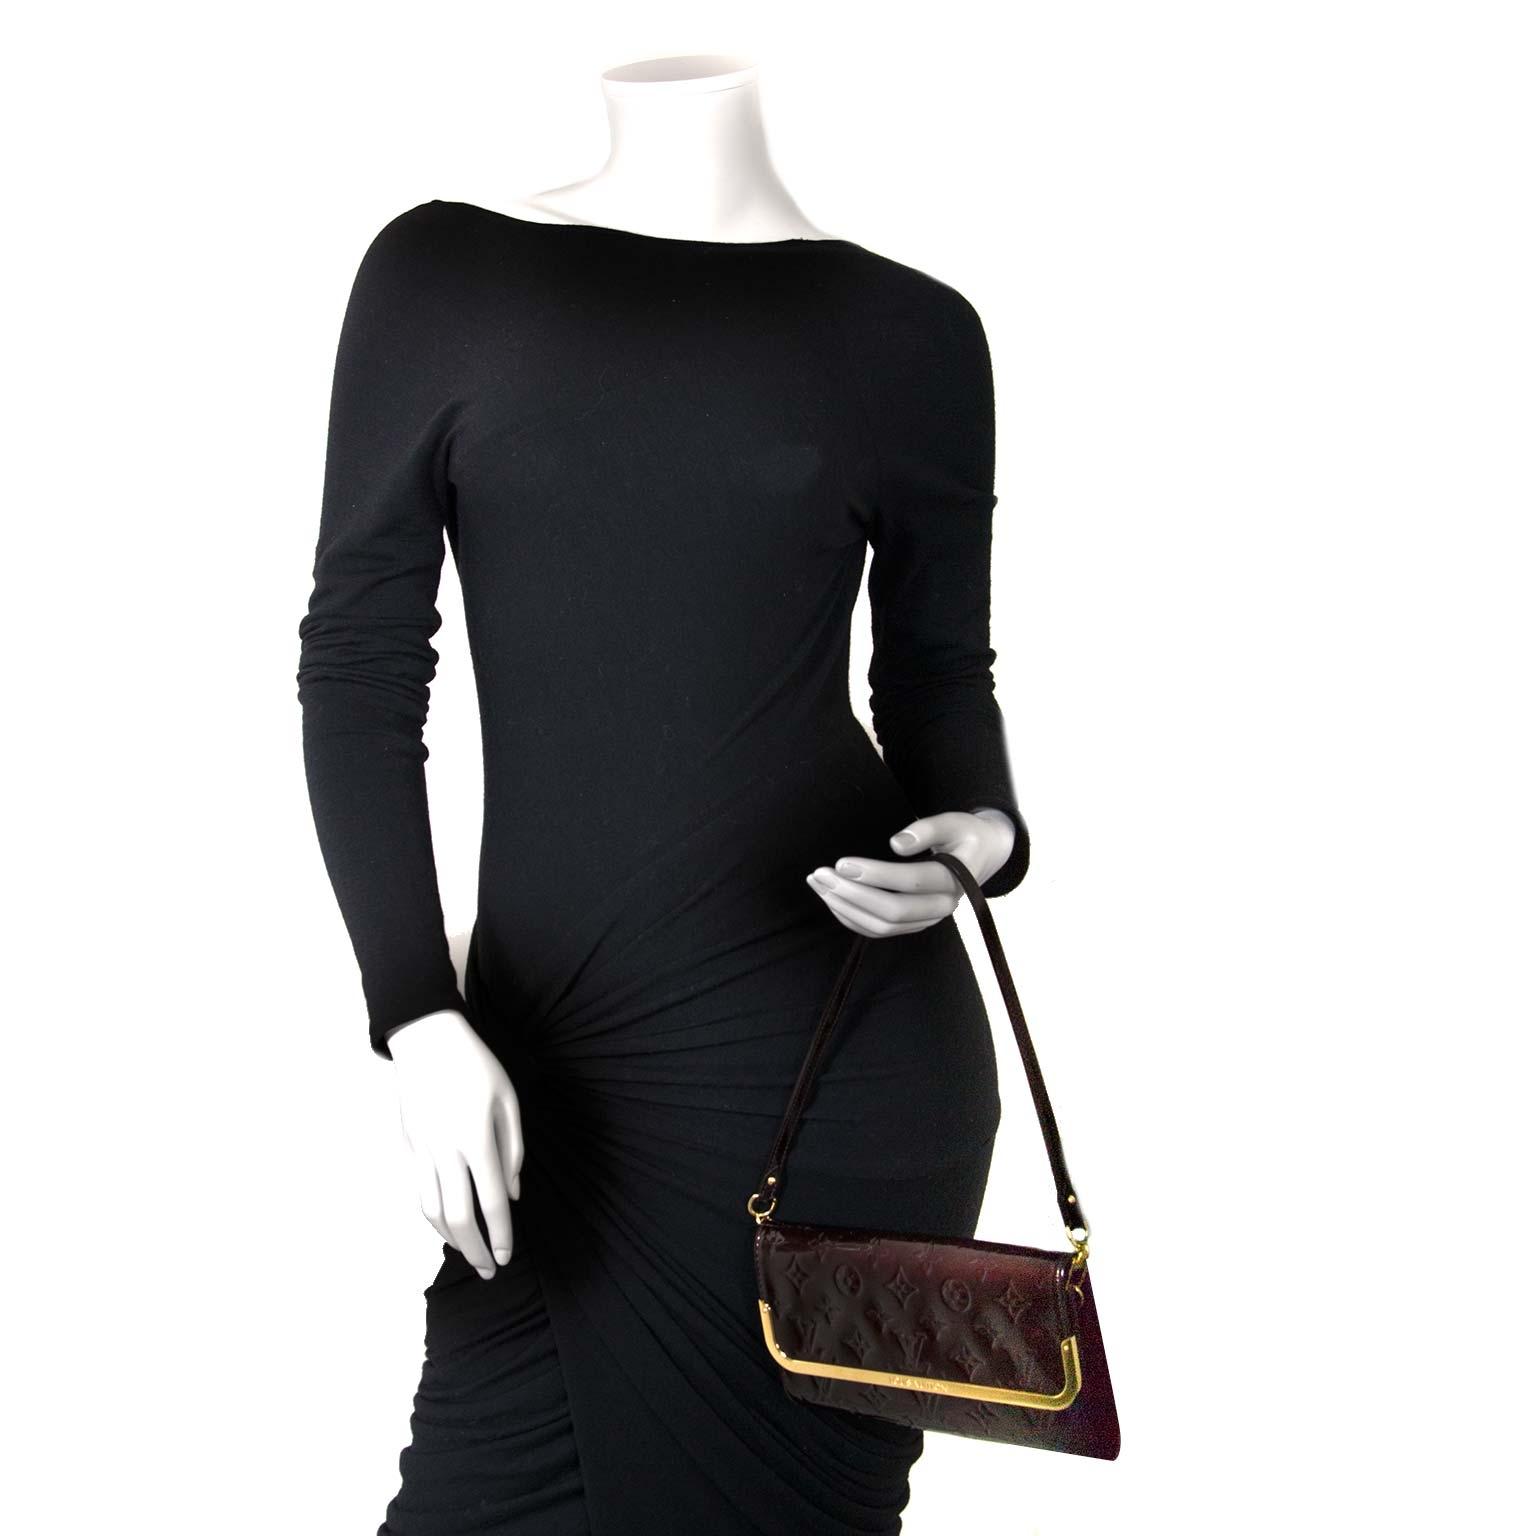 buy authentic second hand Louis Vuitton Rossmore Amarante Monogram Vernis at labellov vintage online store antwerp